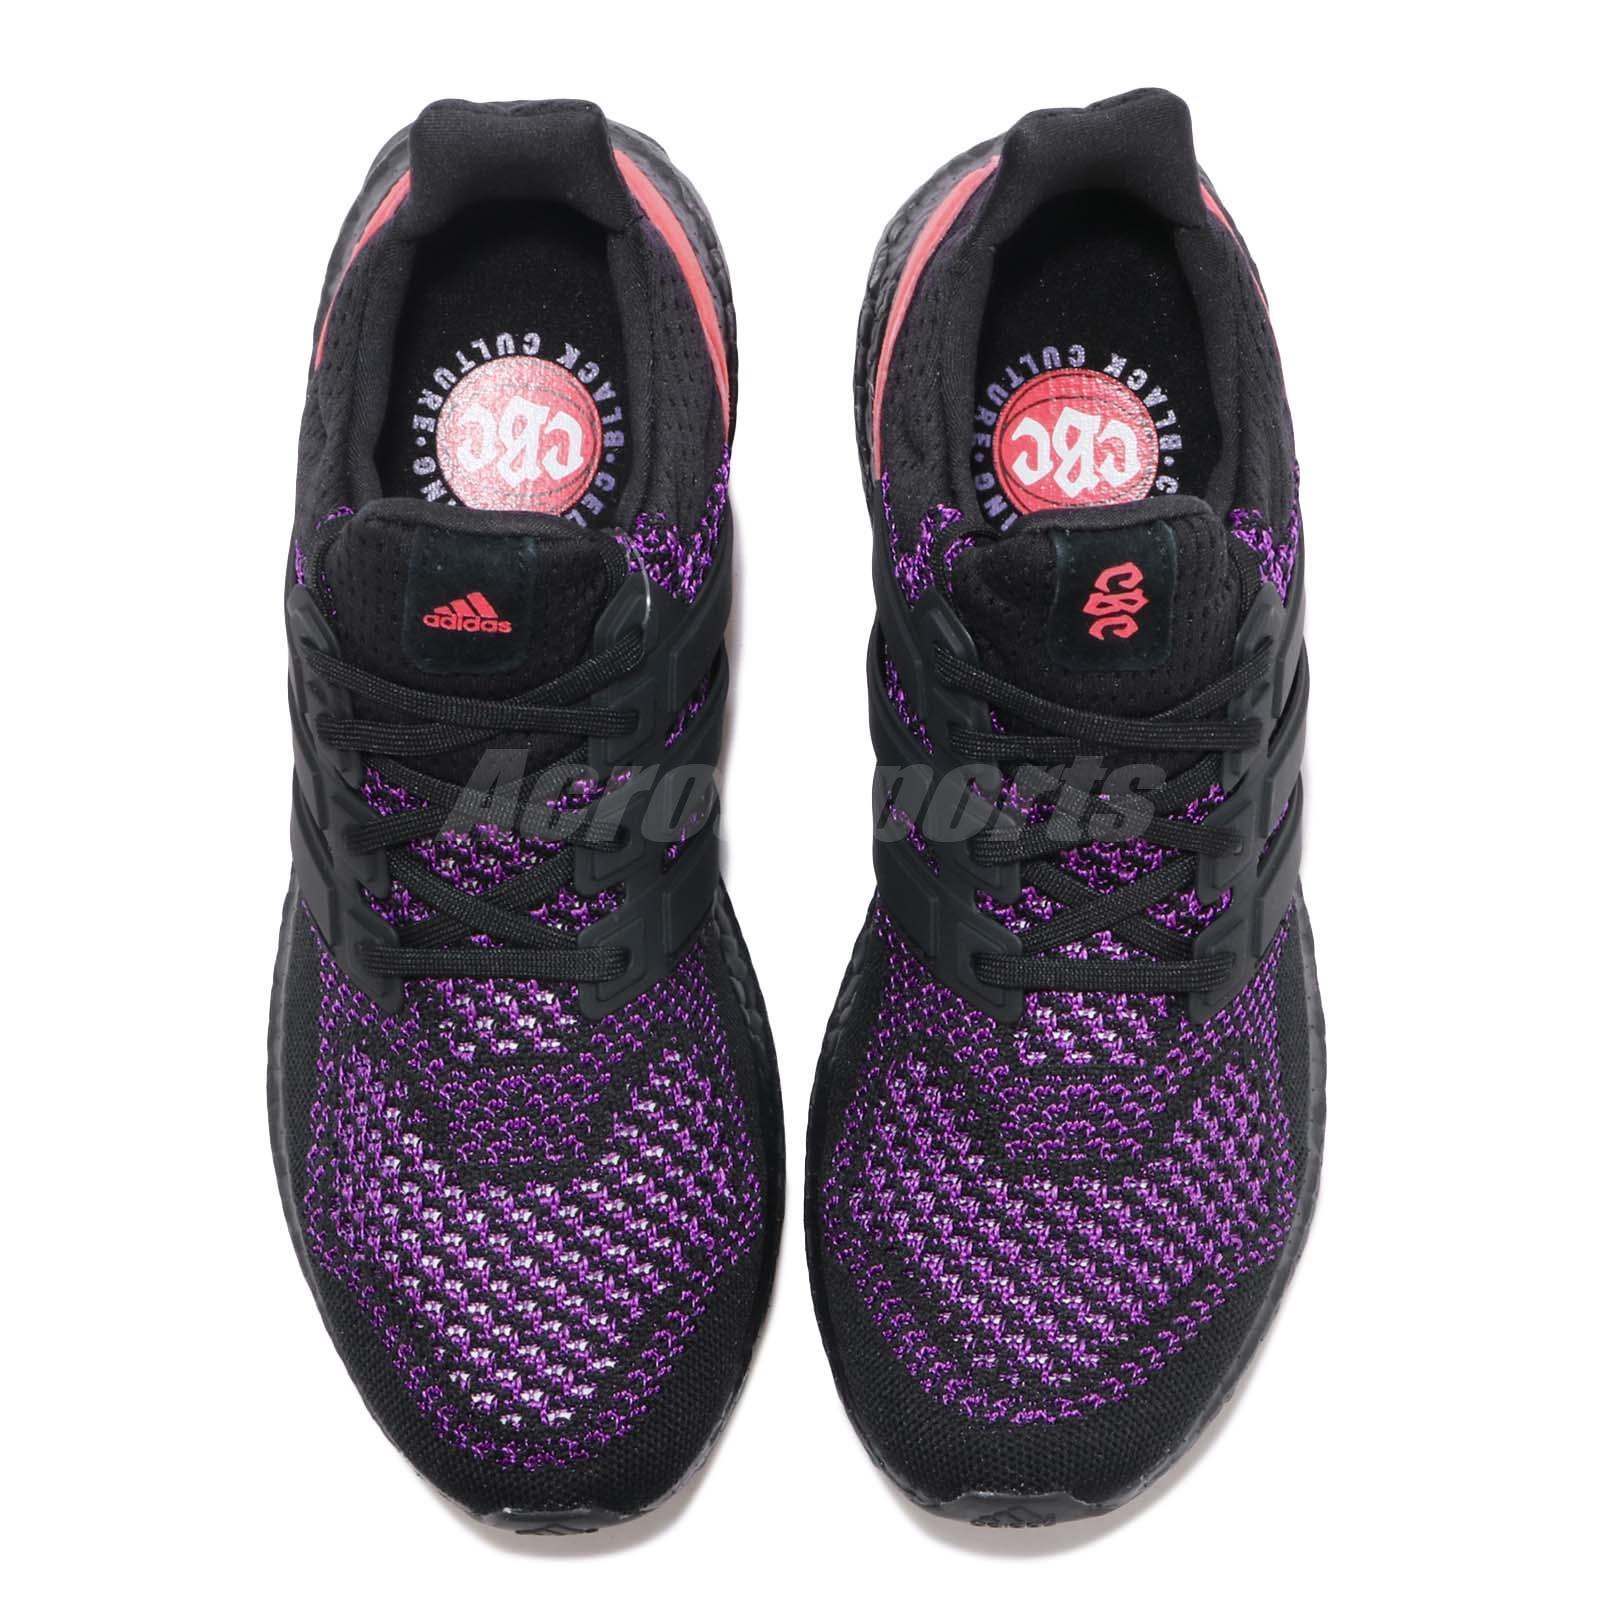 31641b081dd9a adidas UltraBOOST CBC Black Purple Pink Men Running Training Shoe ...